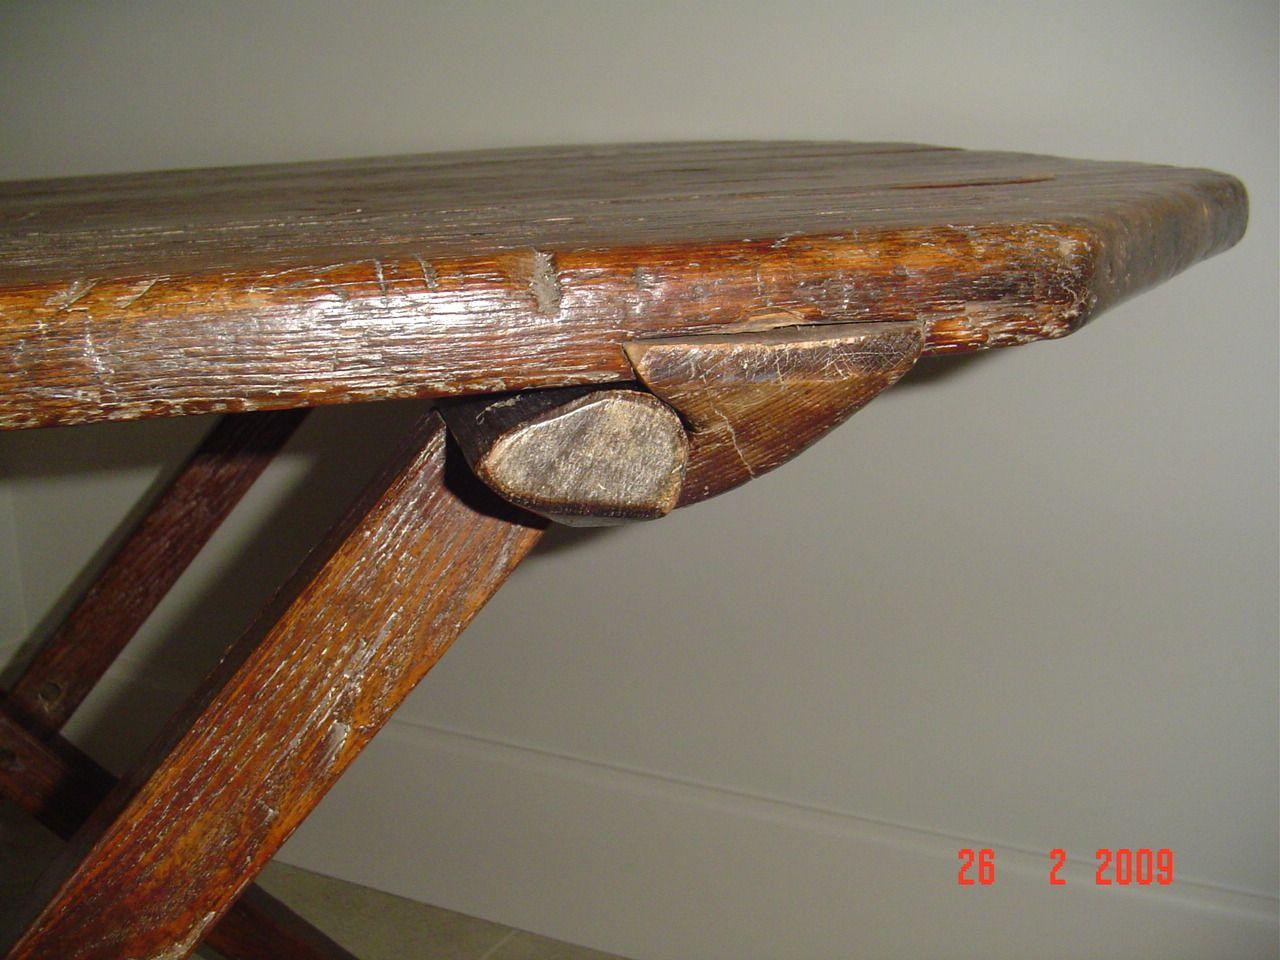 Antique Pine Furniture For Sale: Antique Primitive Trestle Table Canadian  Pine Wood Furniture - Antique Pine Furniture For Sale: Antique Primitive Trestle Table